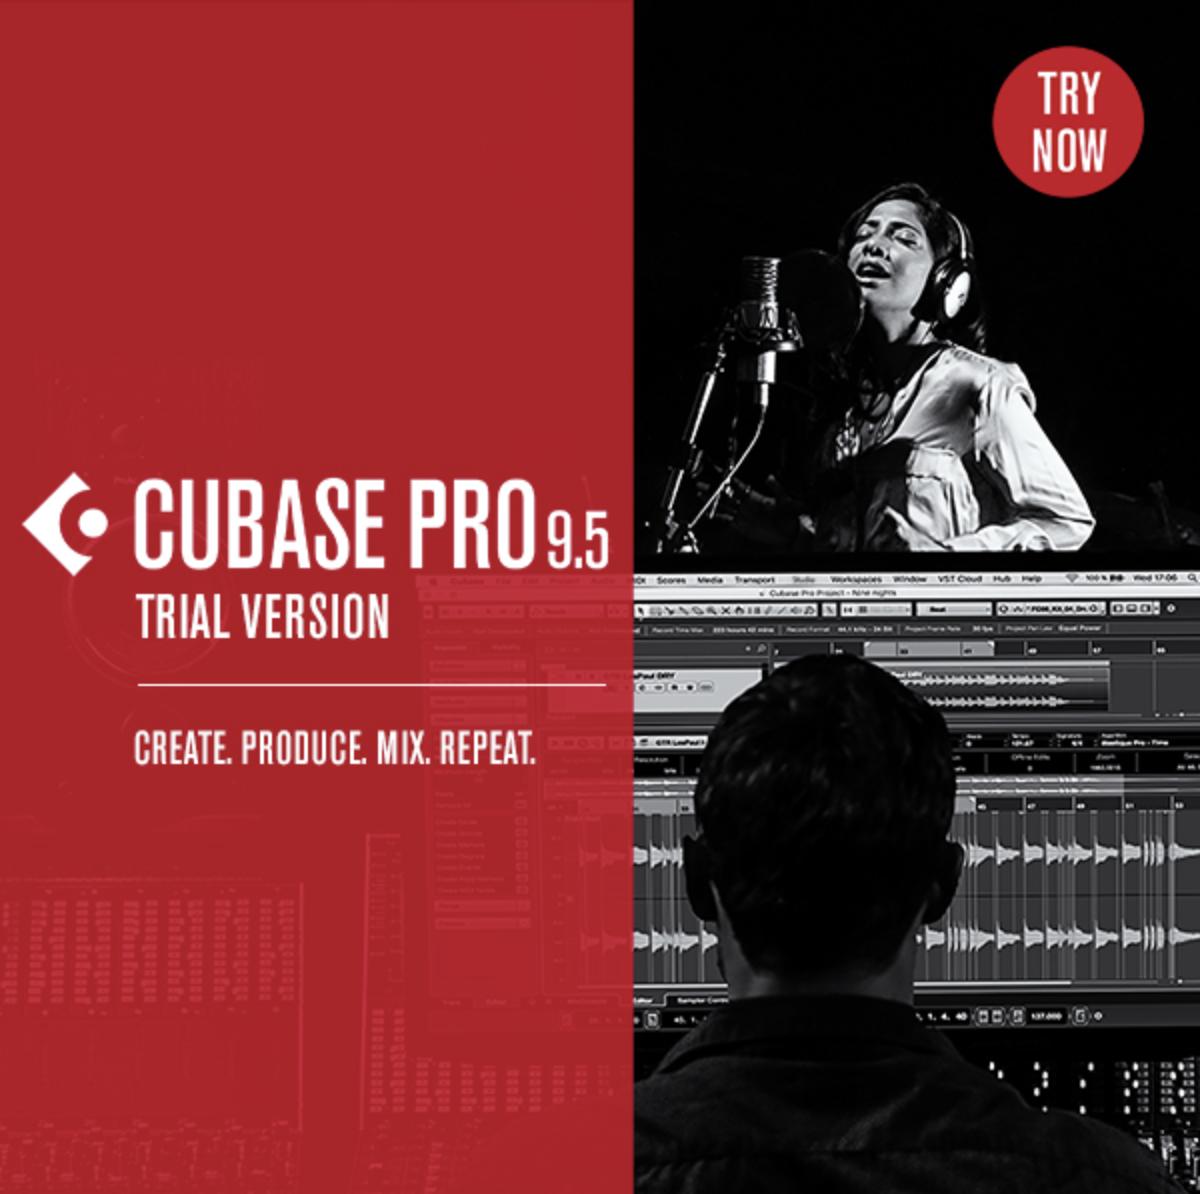 cubase 9.5 trial